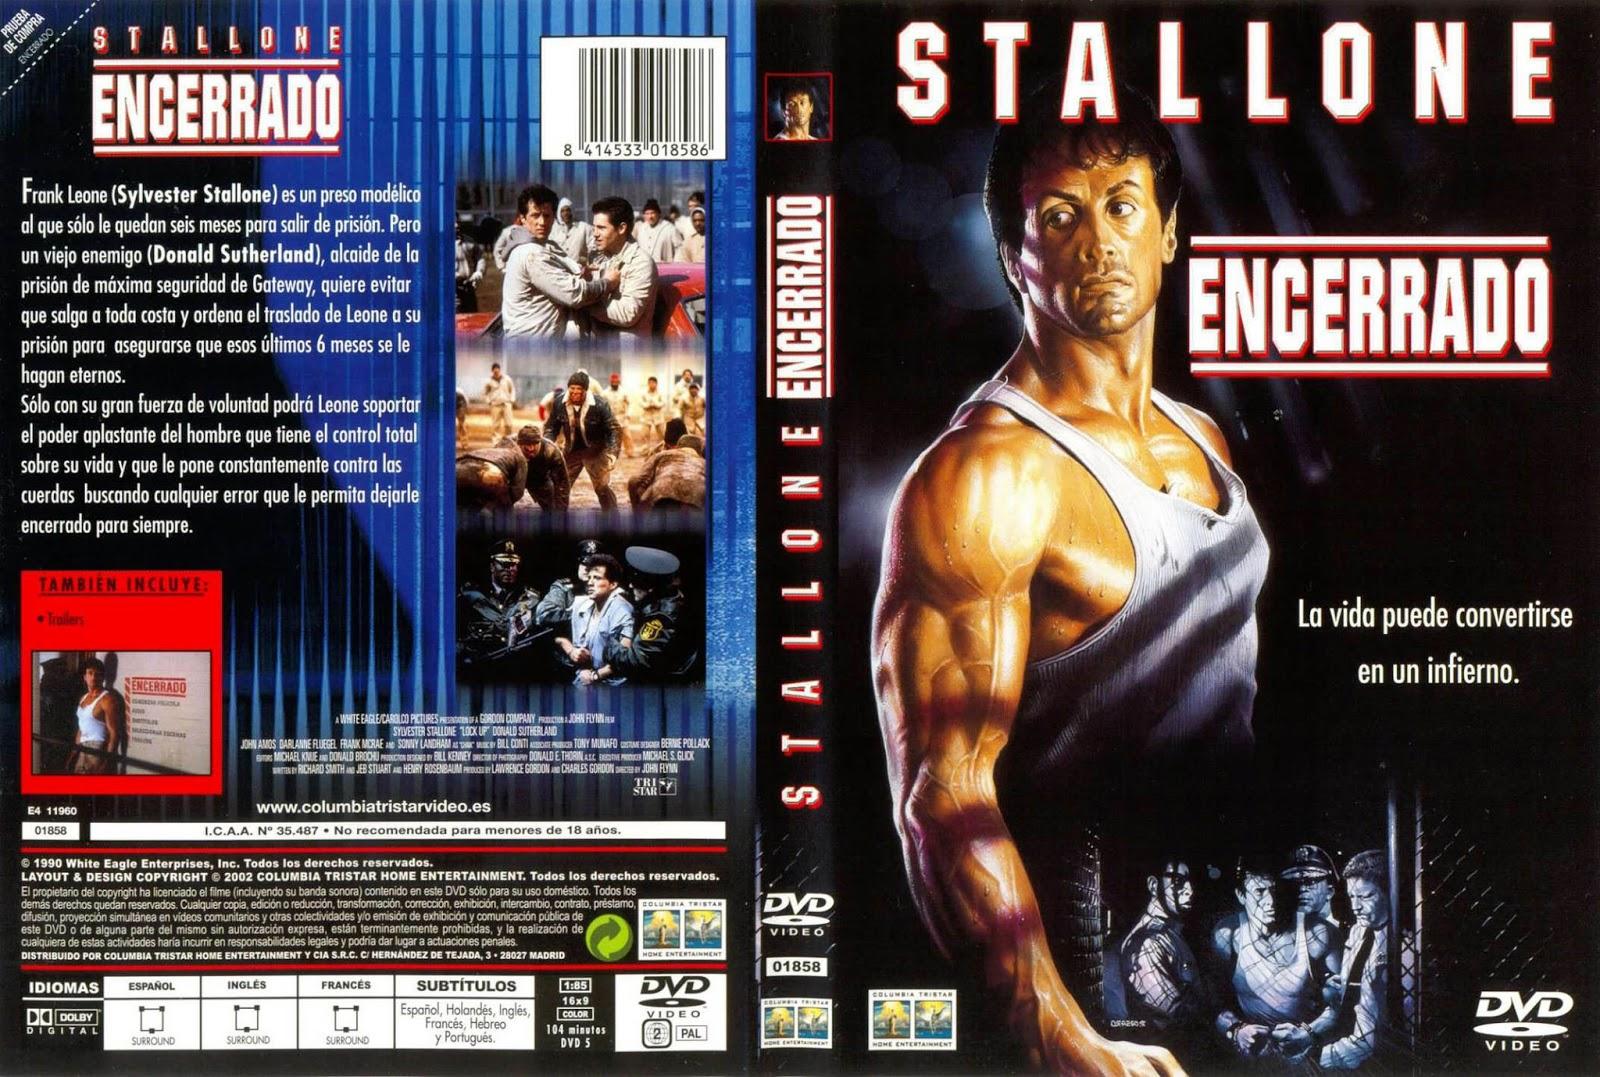 Encerrado DVD